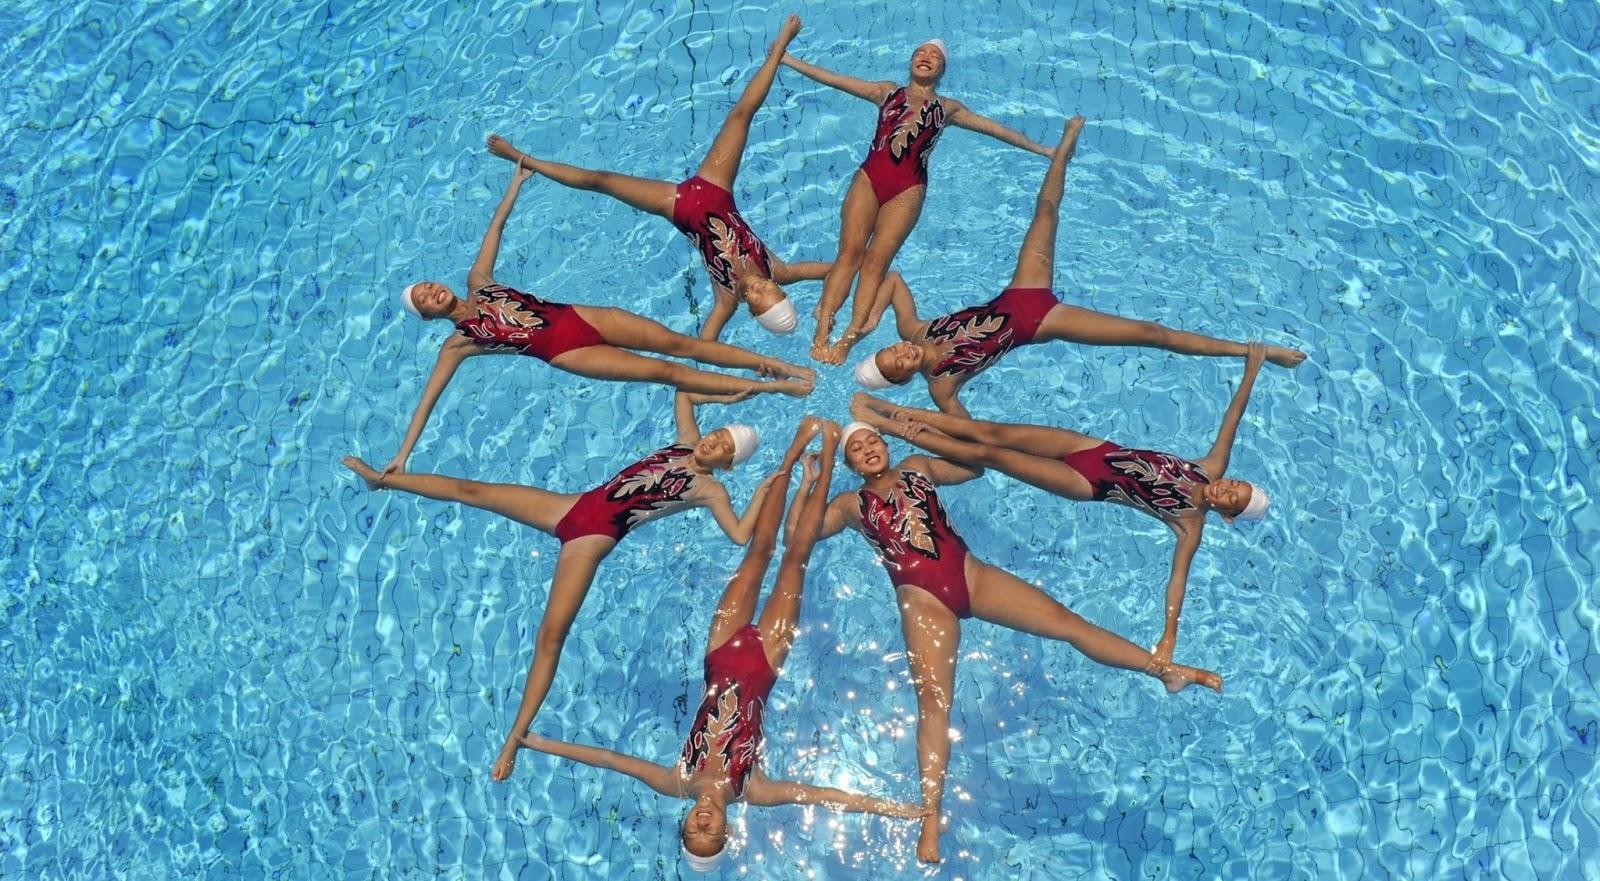 http://3.bp.blogspot.com/-Dukf1Ljmcls/URCr-i_k-mI/AAAAAAAAAm4/cZj5hs8fKkk/s1600/Swimming+HD+Wallpapers+11.jpg